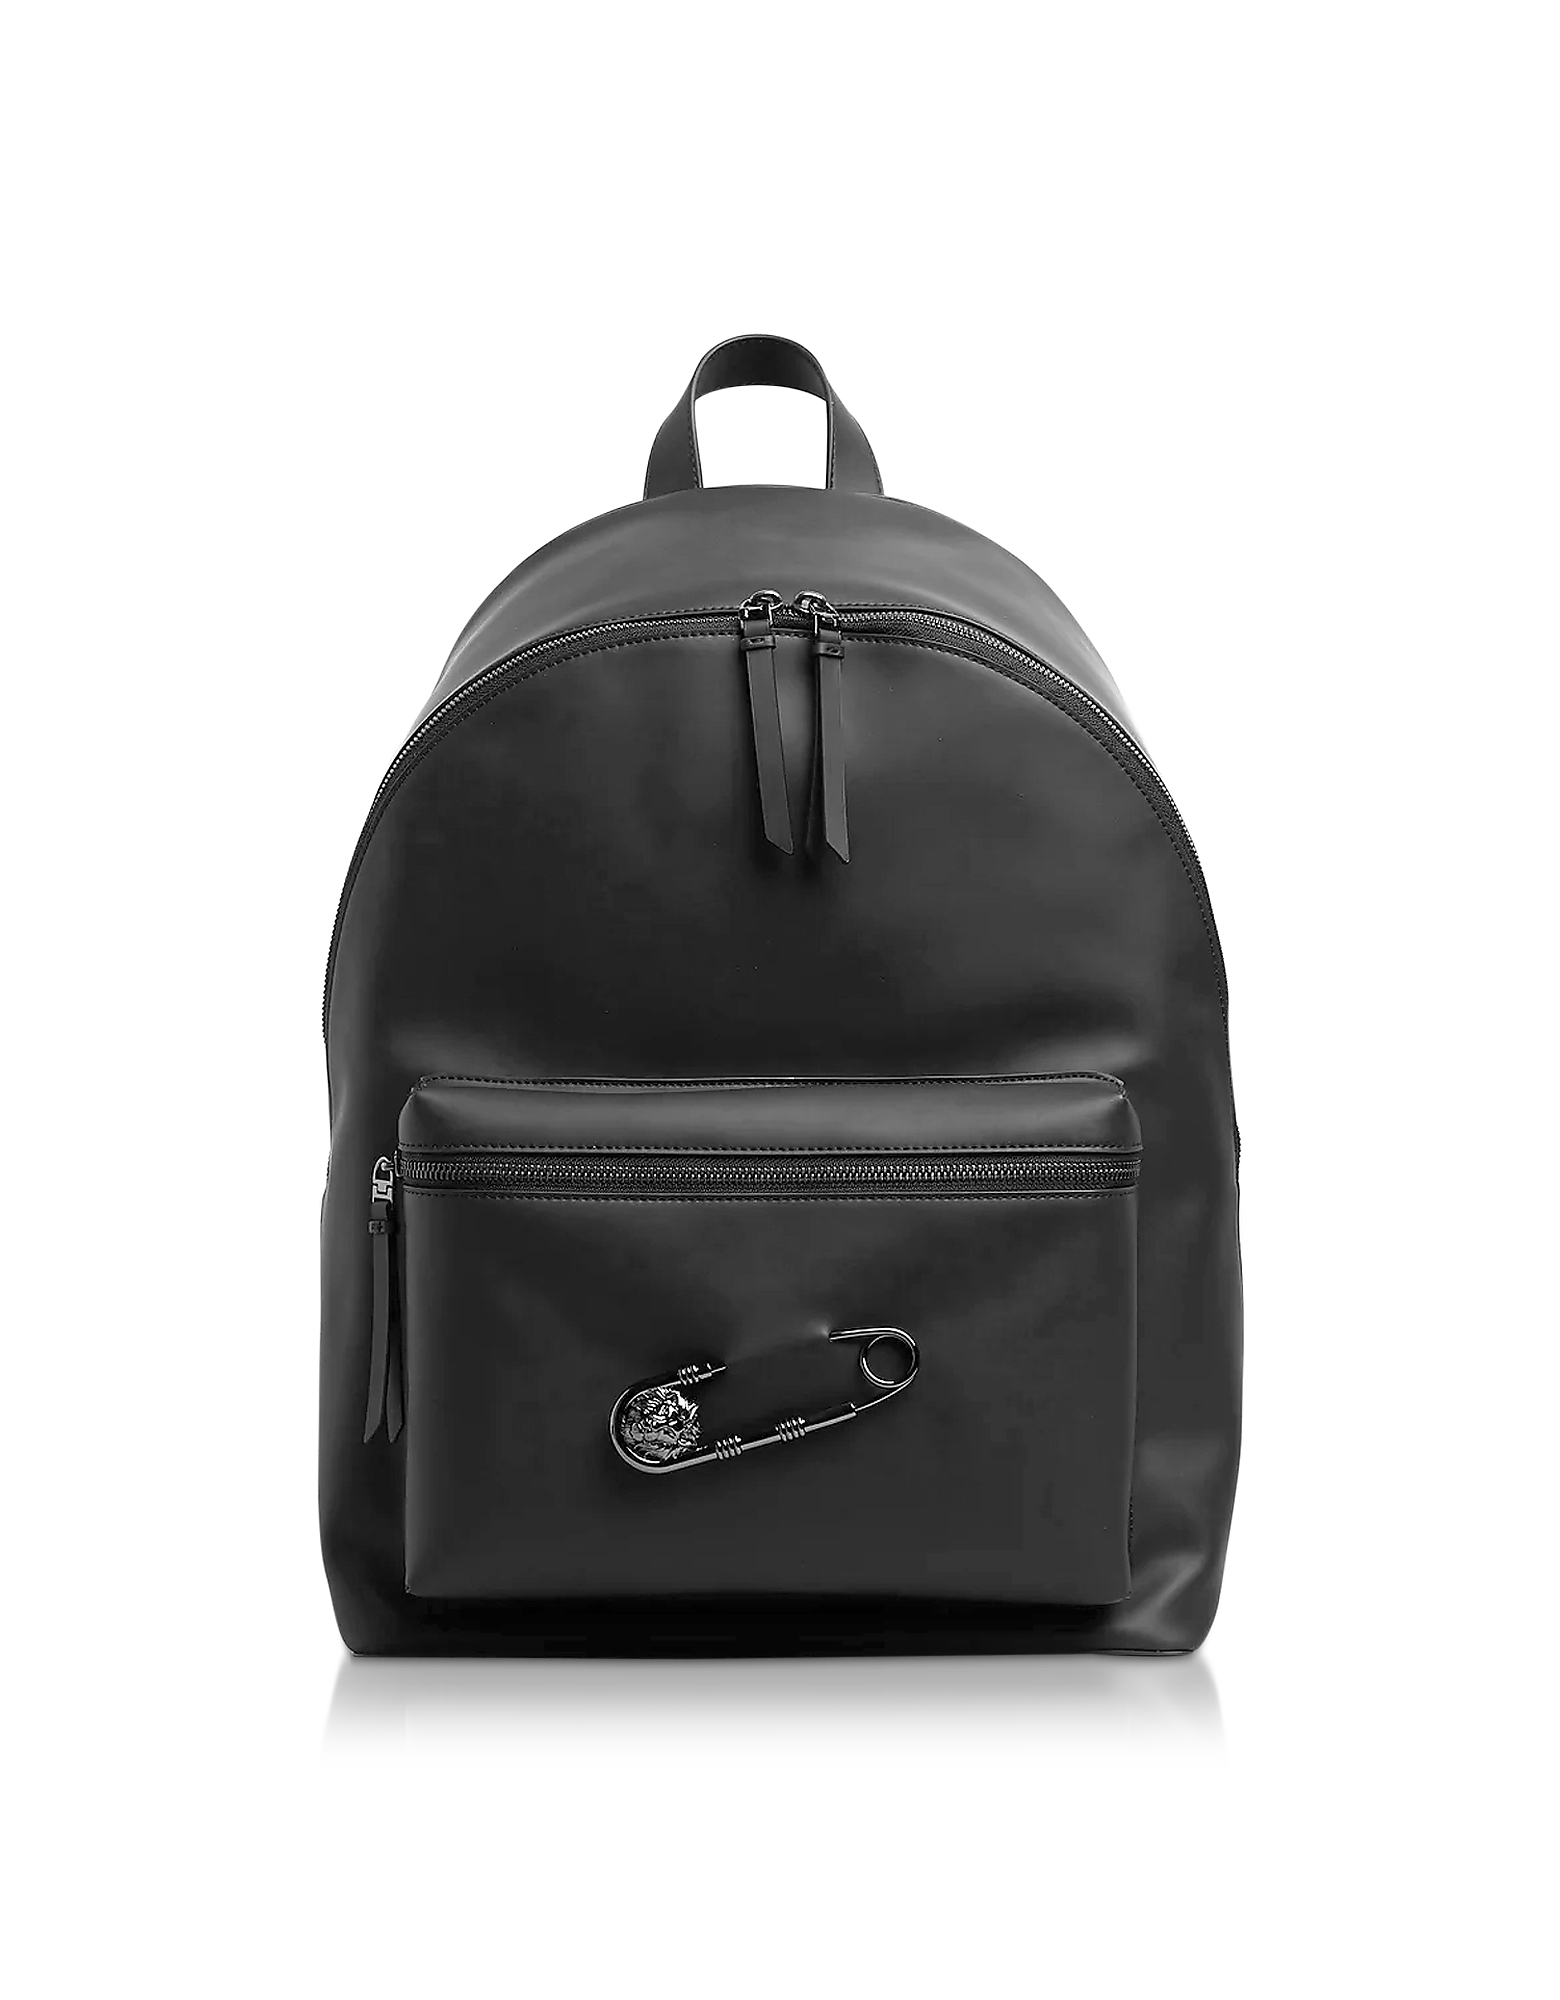 Black Gummy Calf Leather Backpack